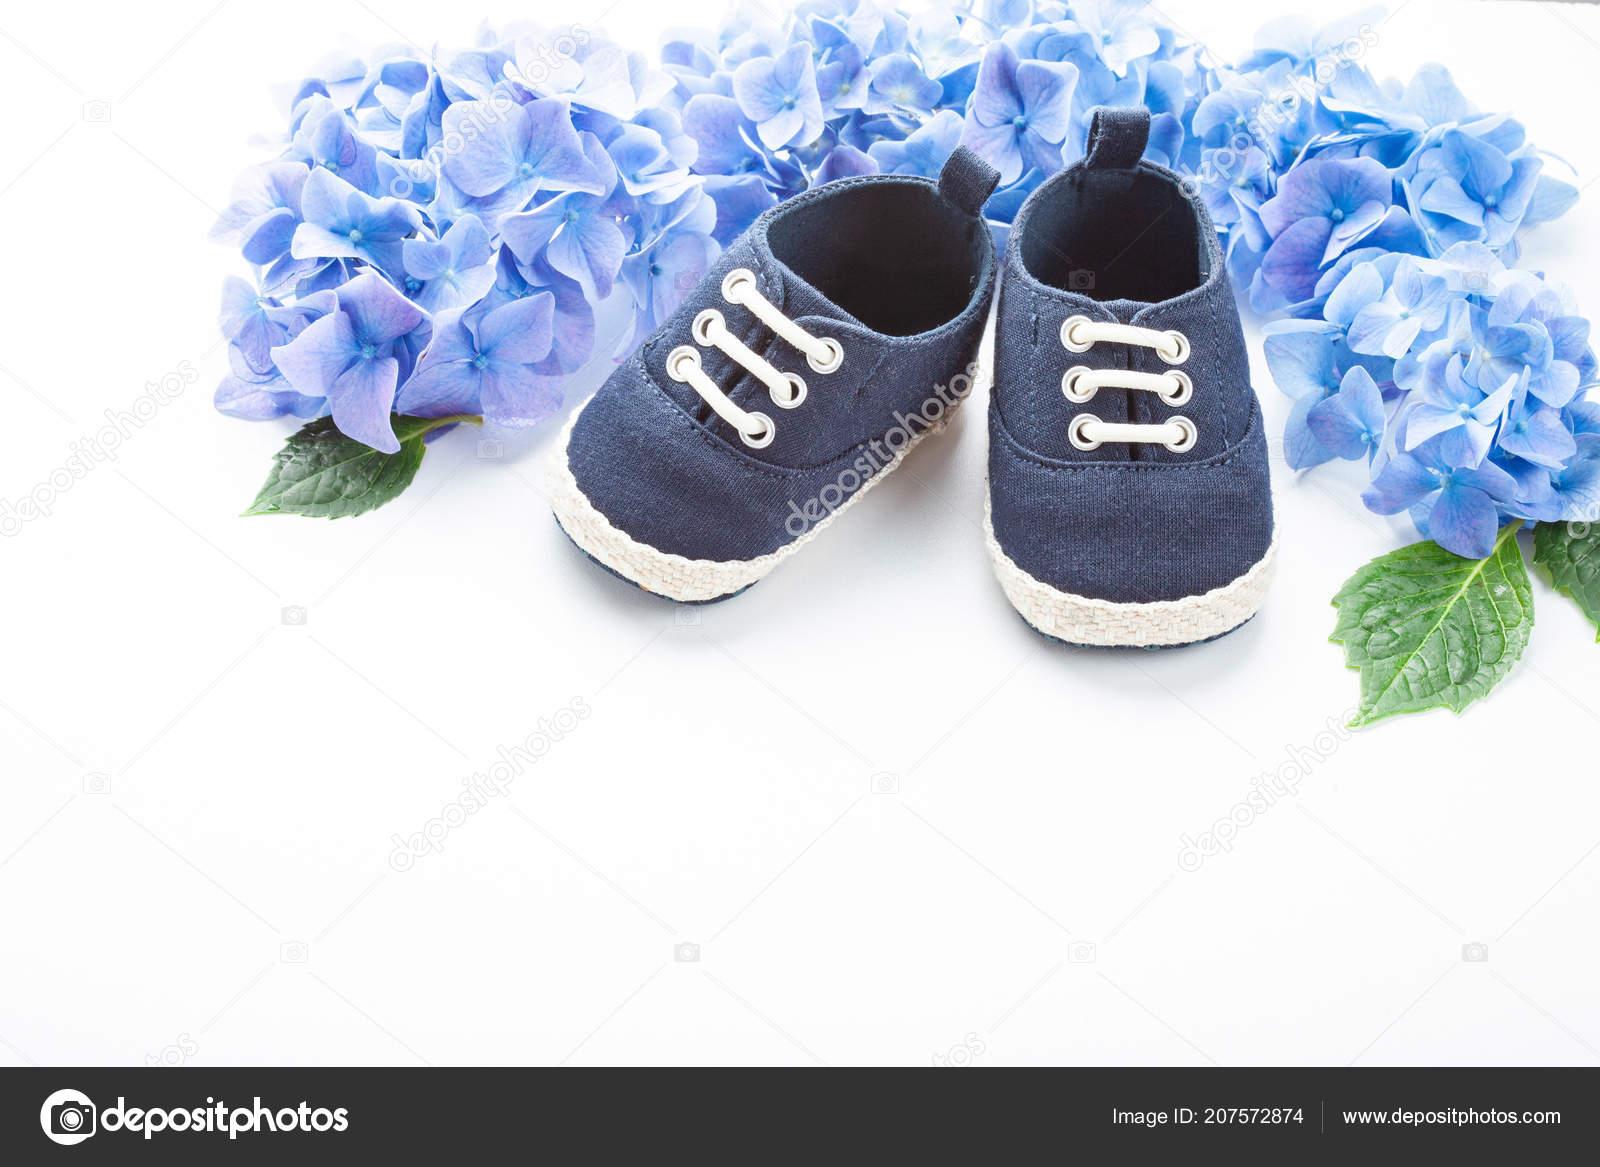 fe29e480e96b Cute Newborn Baby Boy Shoes Festive Decoration White Background Baby —  Stock Photo